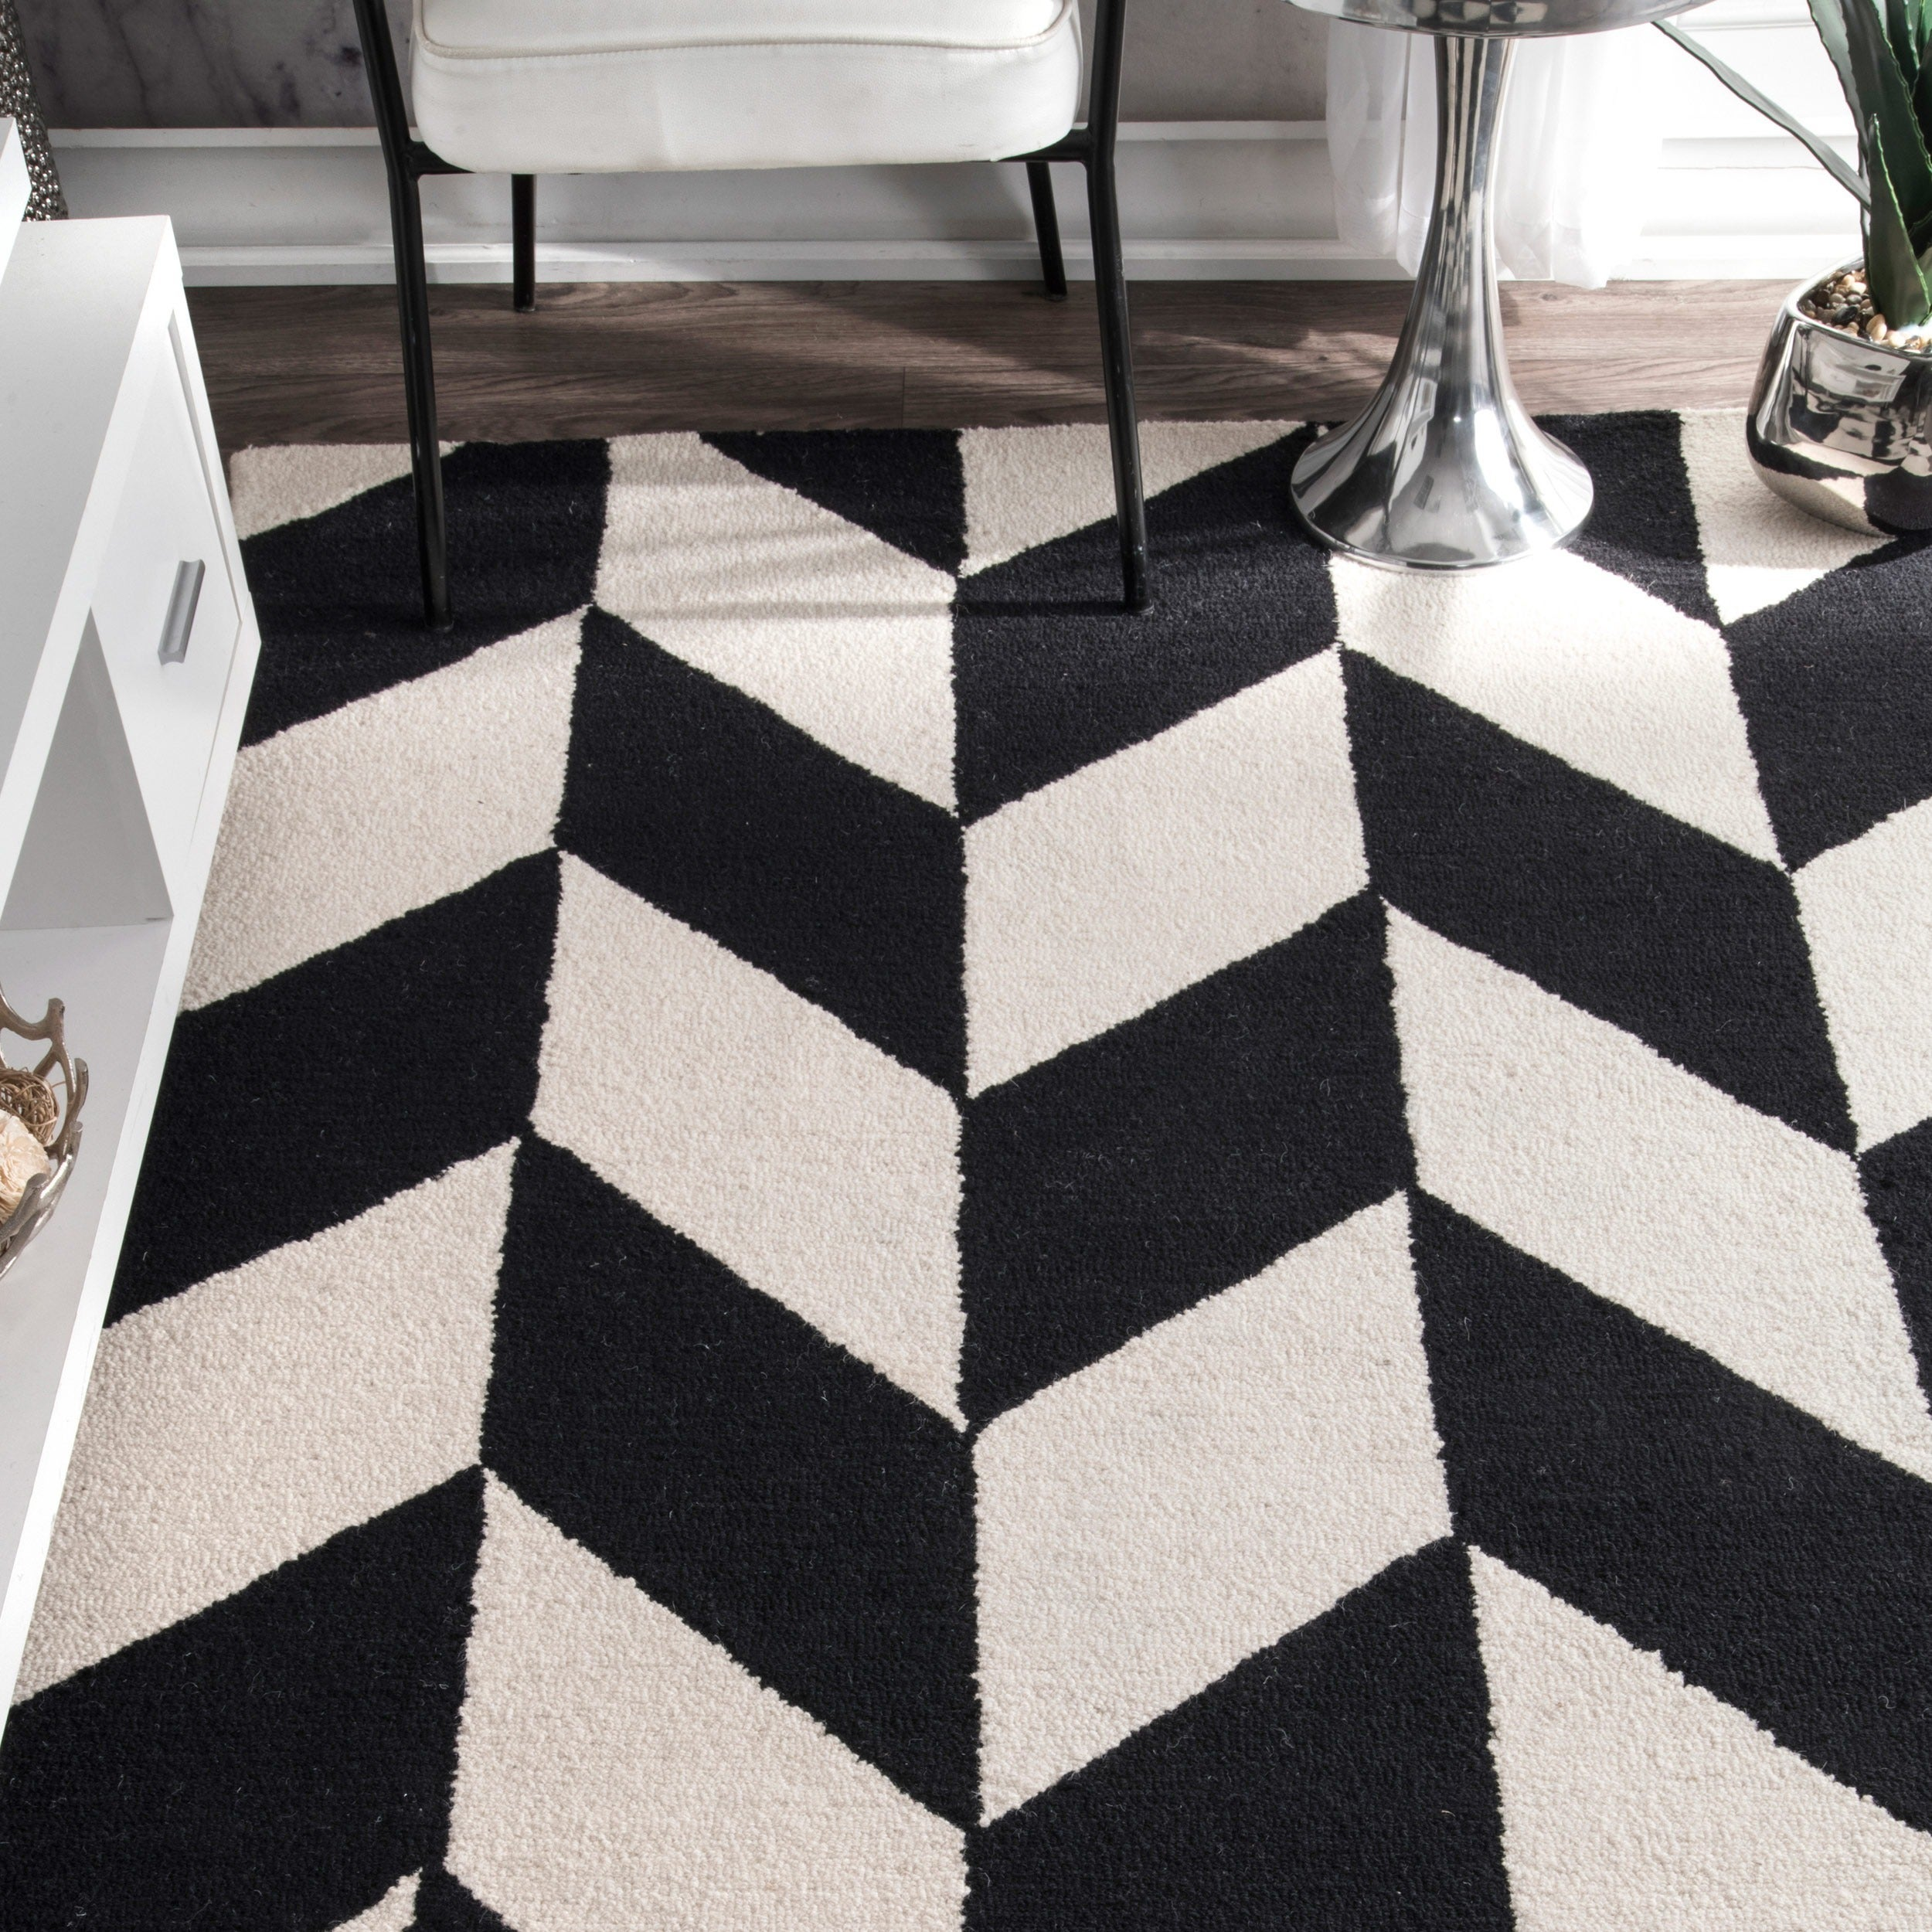 nuLOOM-Black-and-White-Handmade-Mod-Tiles-Wool-Area-Rug thumbnail 7